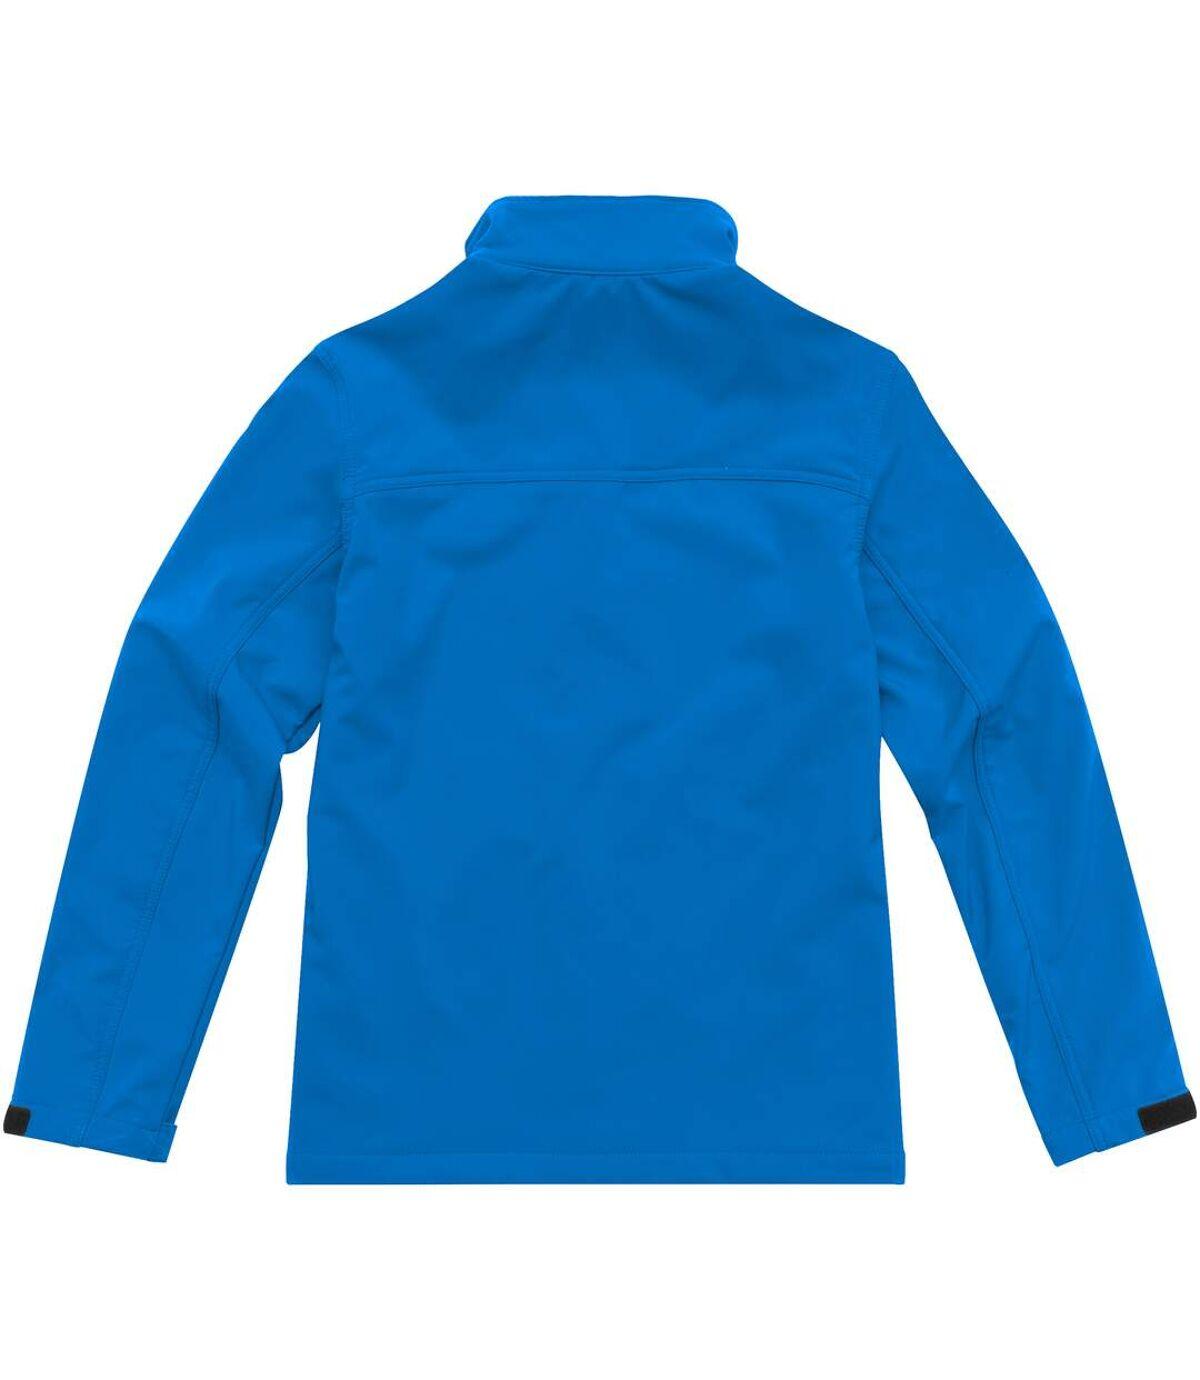 Elevate Mens Maxson Softshell Jacket (Solid Black) - UTPF1866